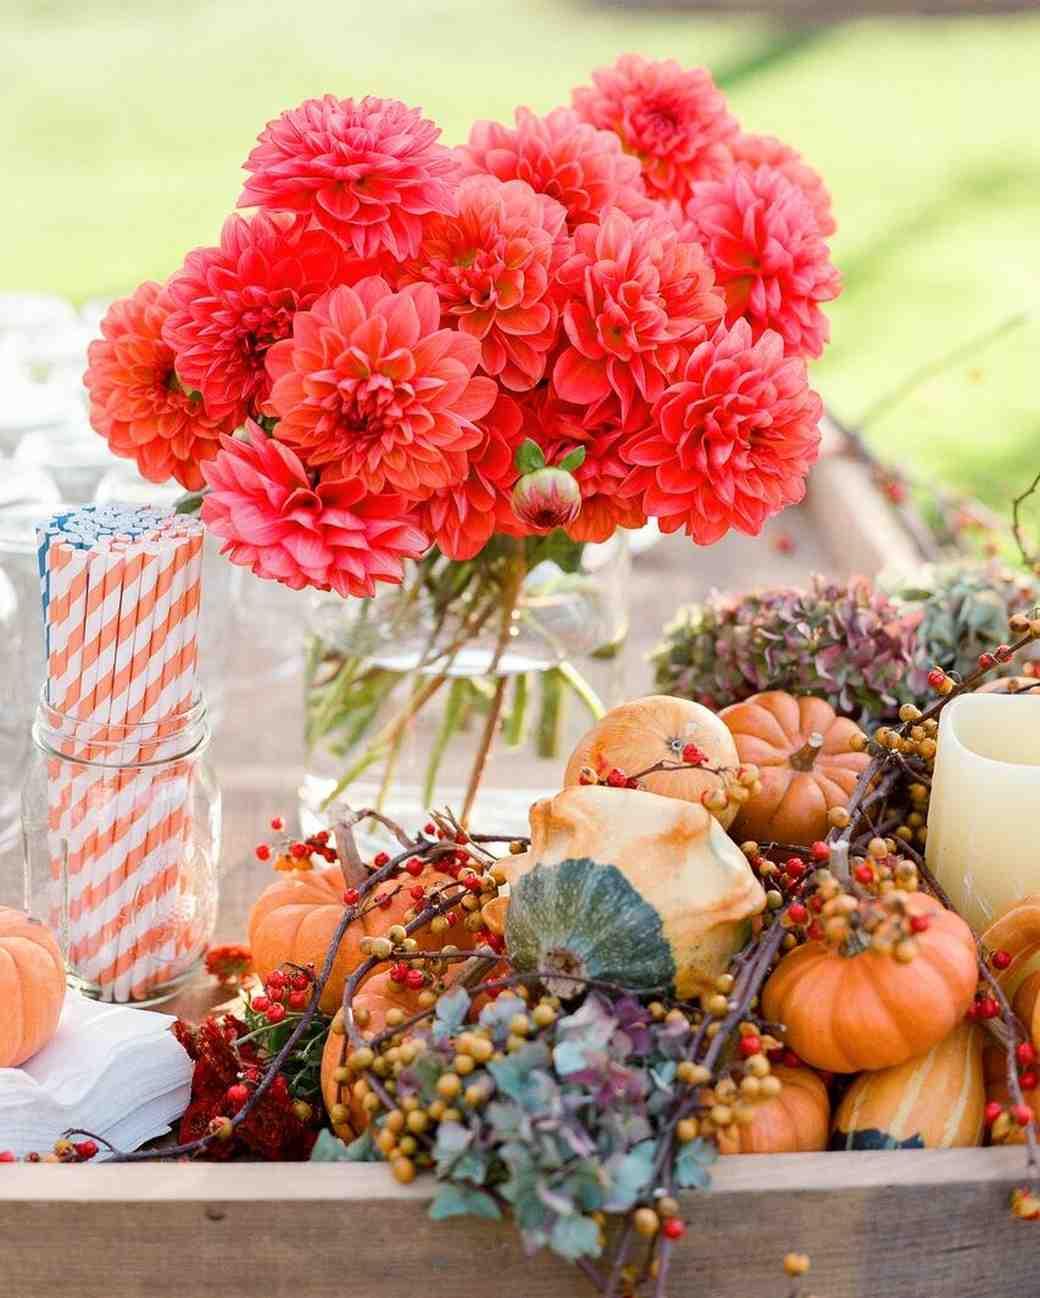 Fall Wedding Ideas Table Decorations: 33 Pumpkin Ideas For Fall Weddings